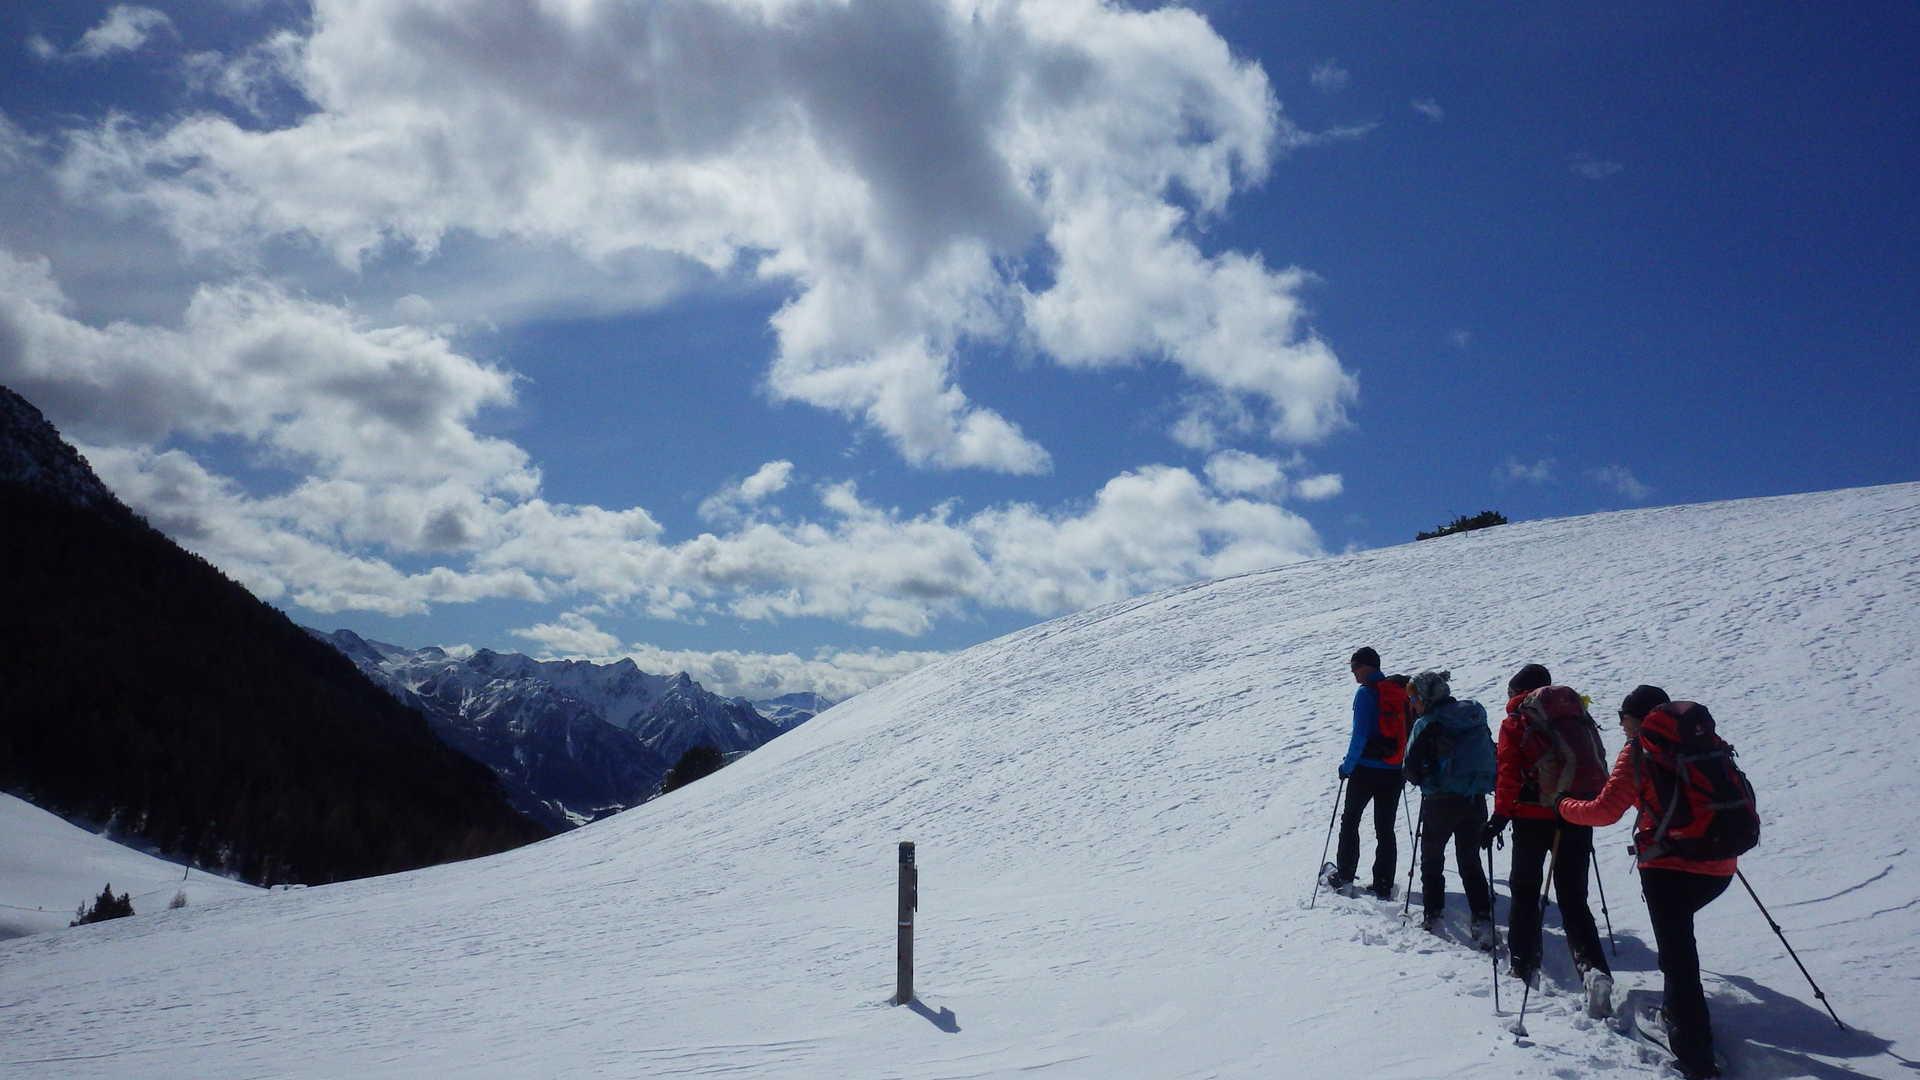 en raquettes au col de Peas, Queyras, Alpes du sud